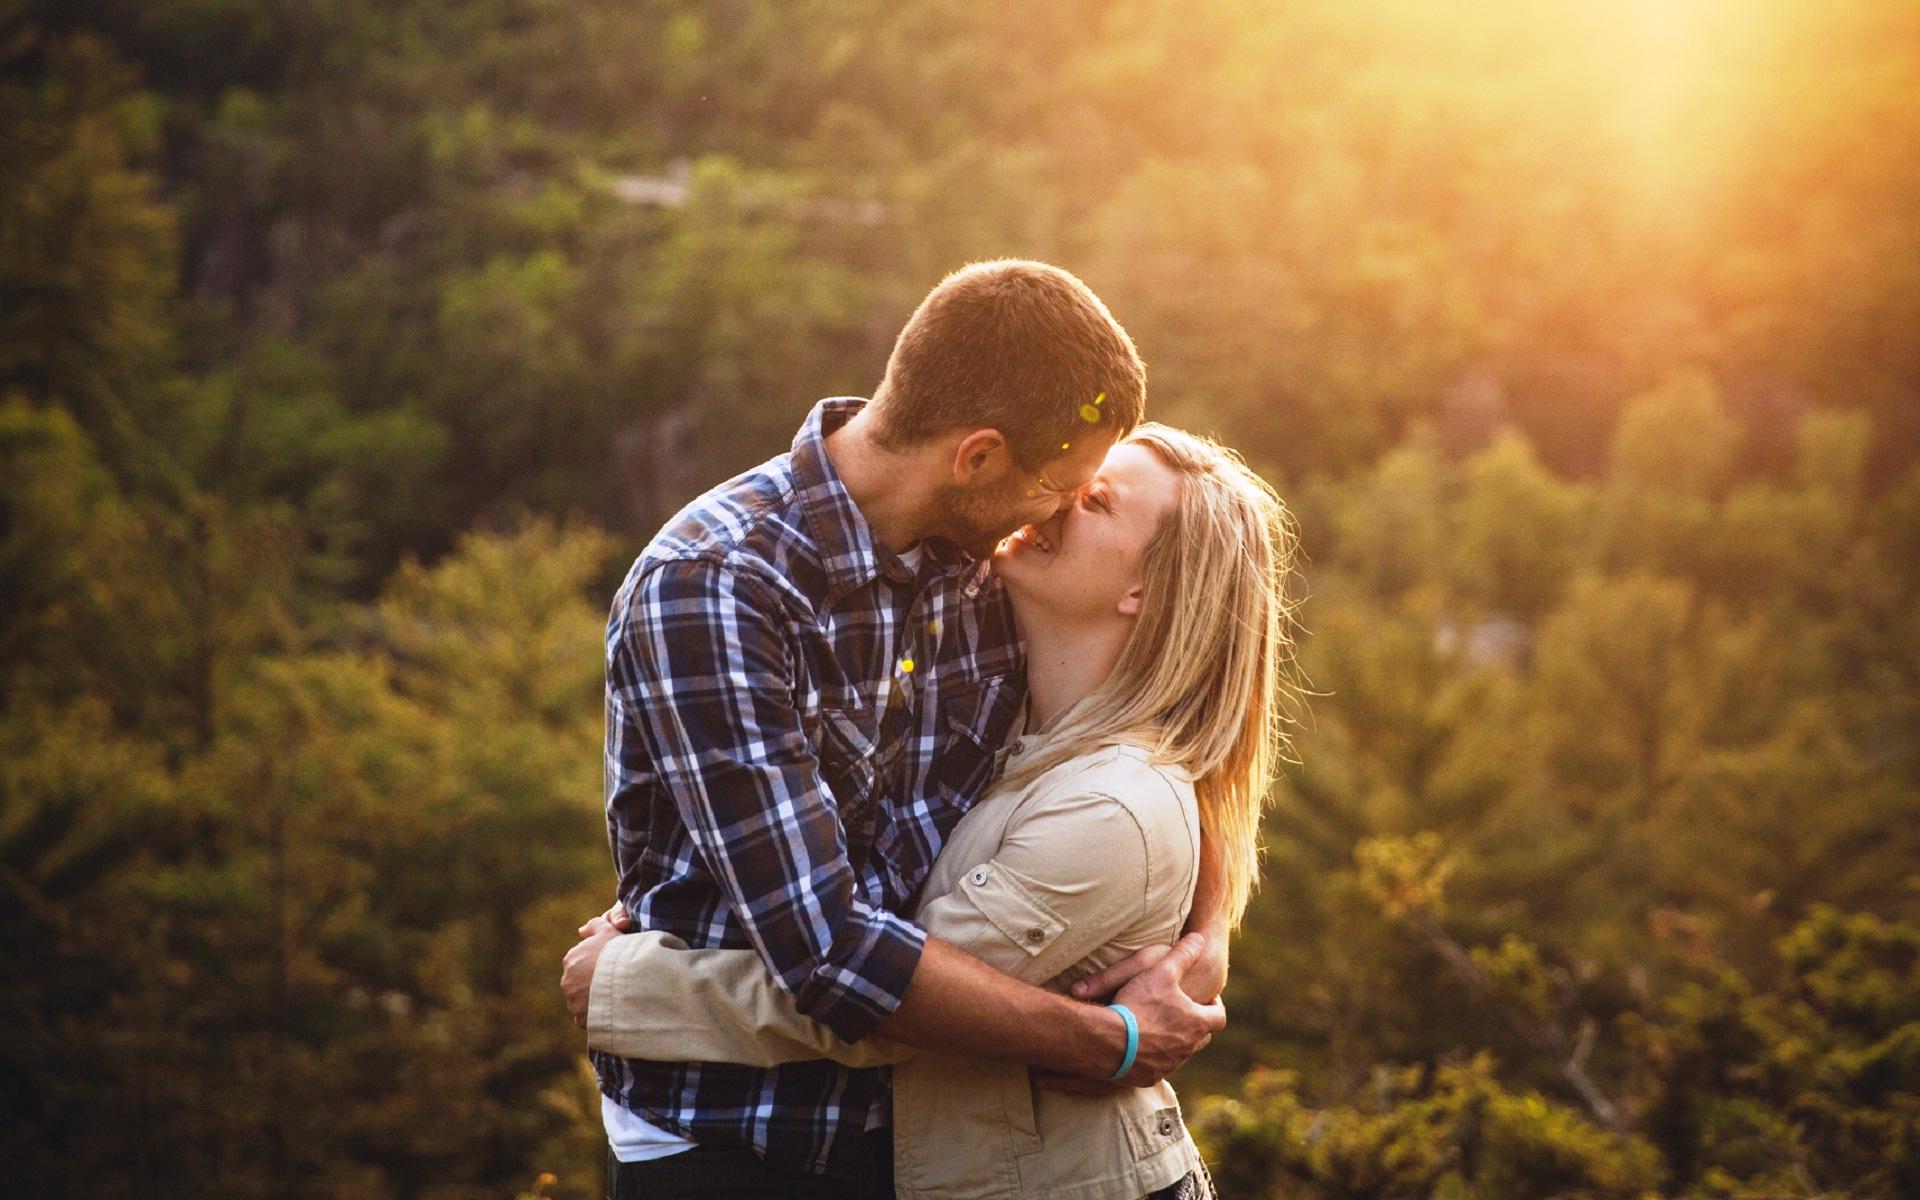 Happiest-sweet-couple-hugs-and-love-wallpapers.jpg